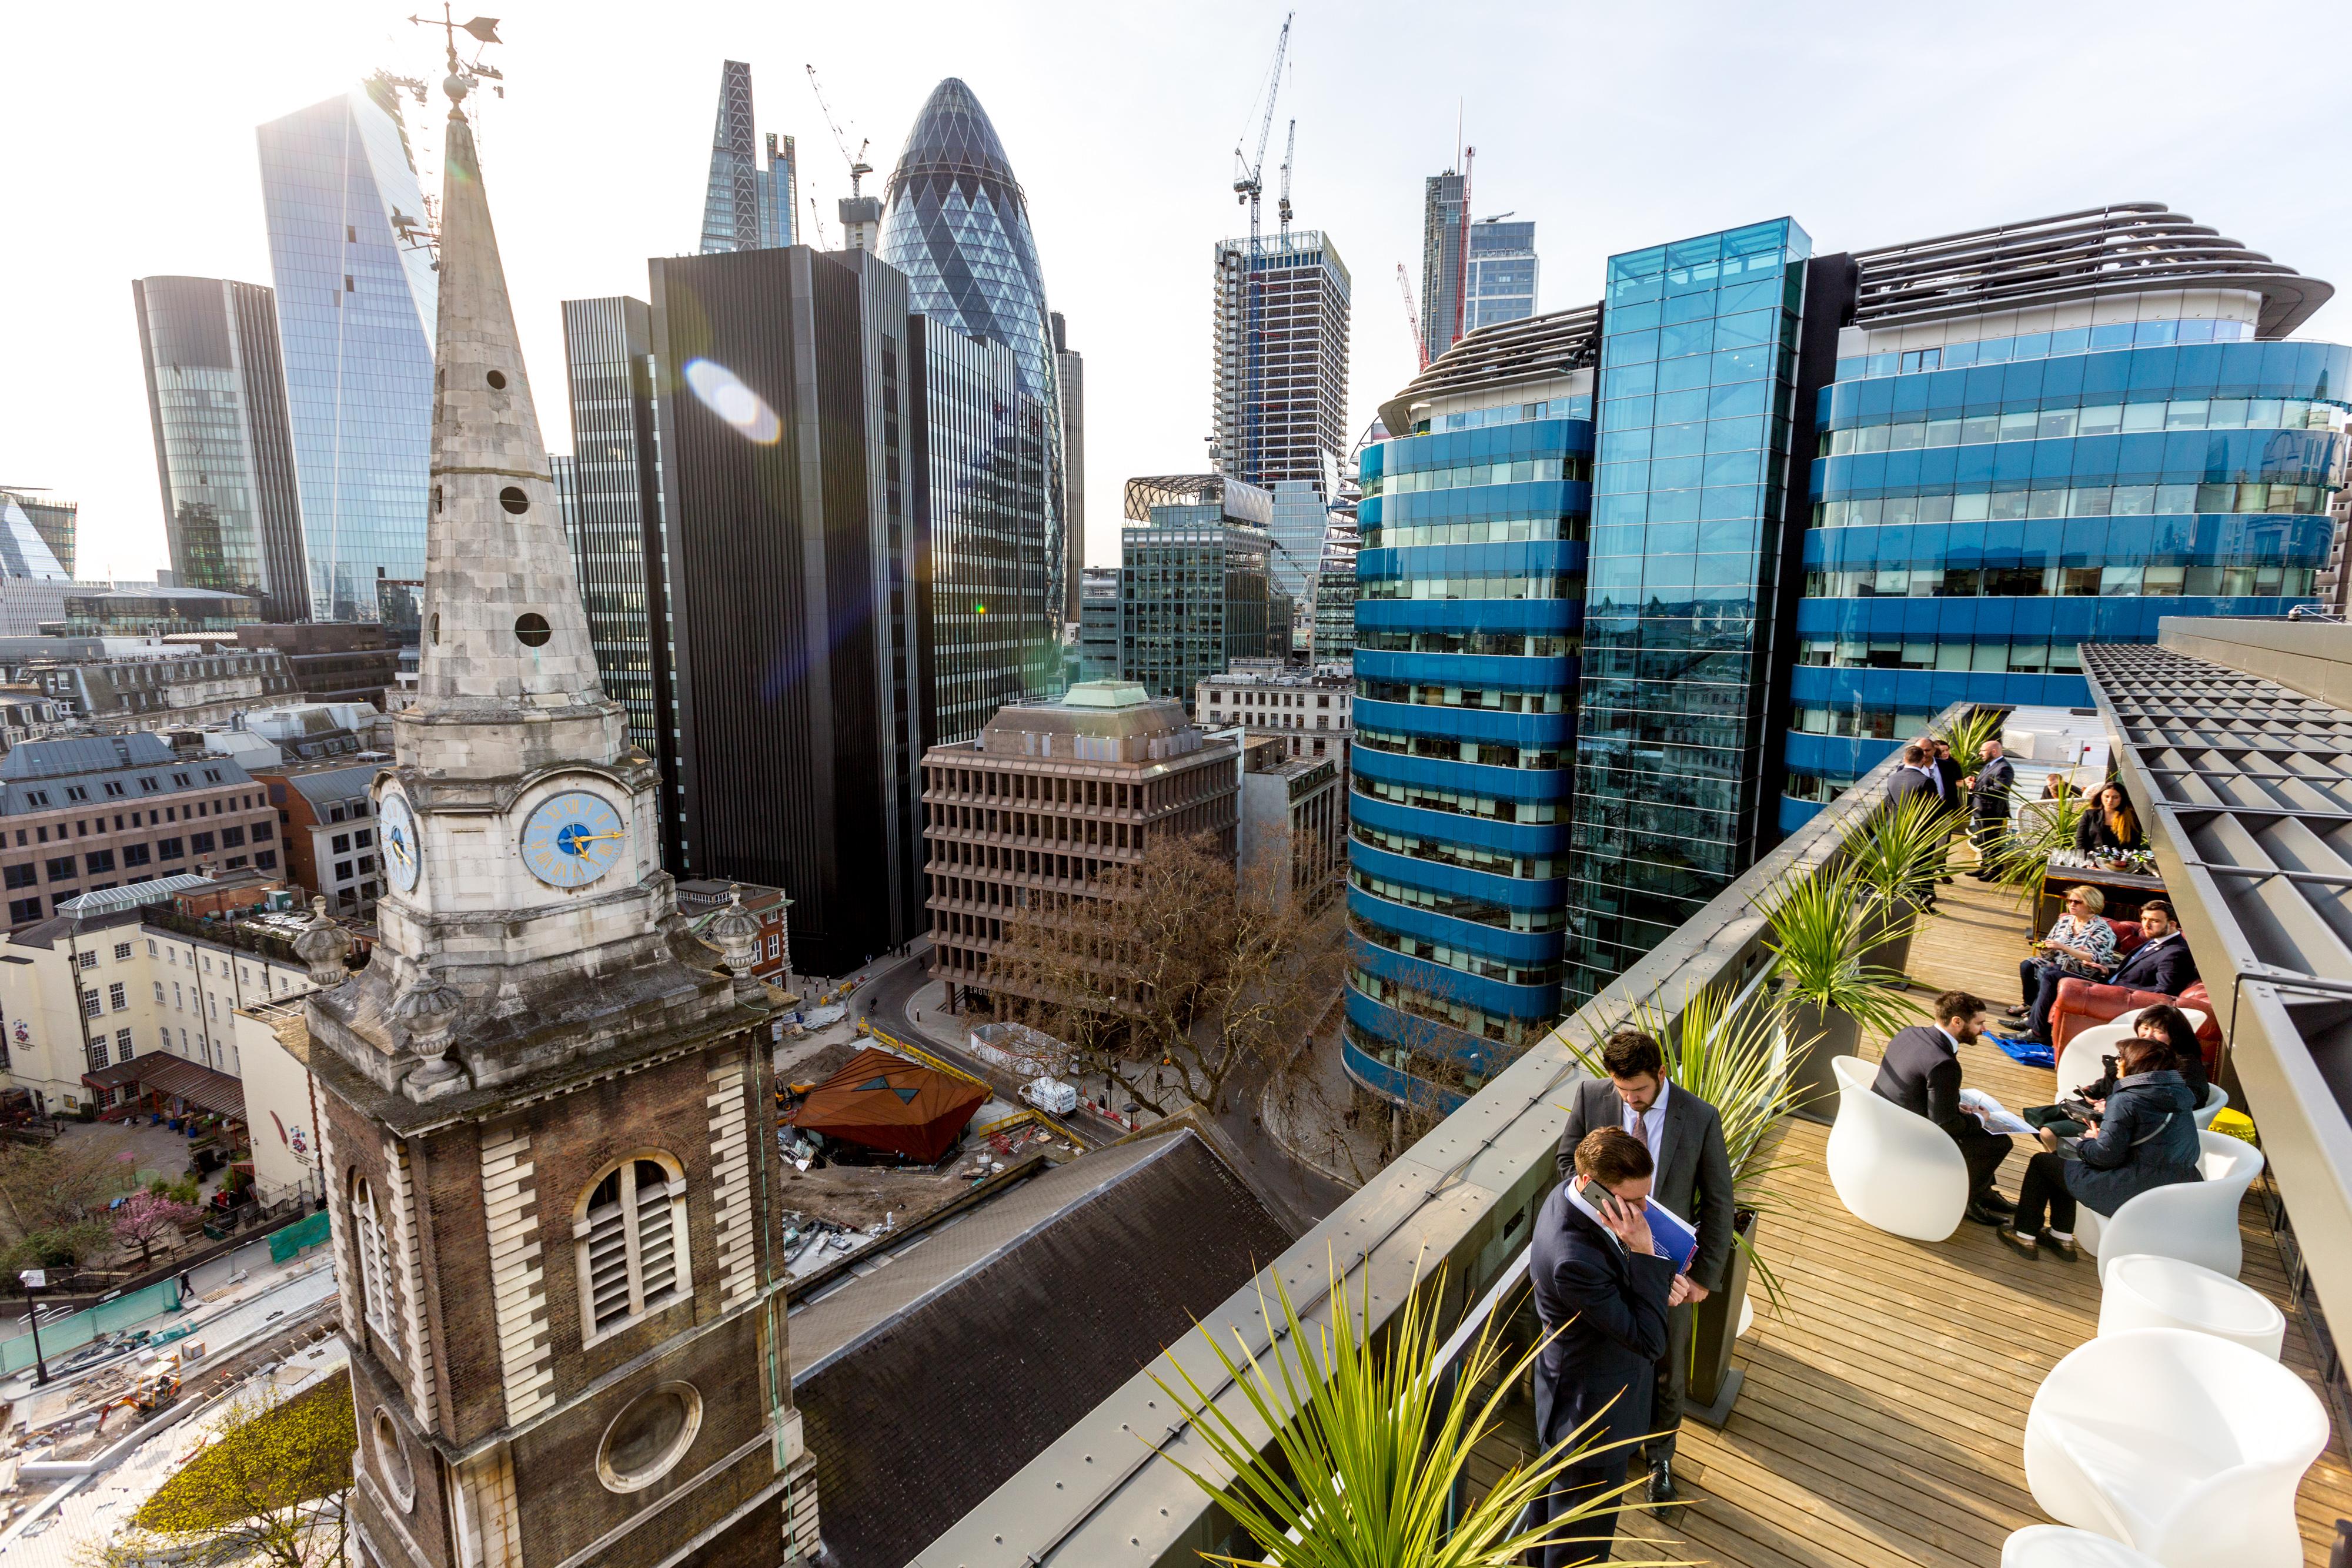 Rooftop Bars in London Best Rooftop Bars in London